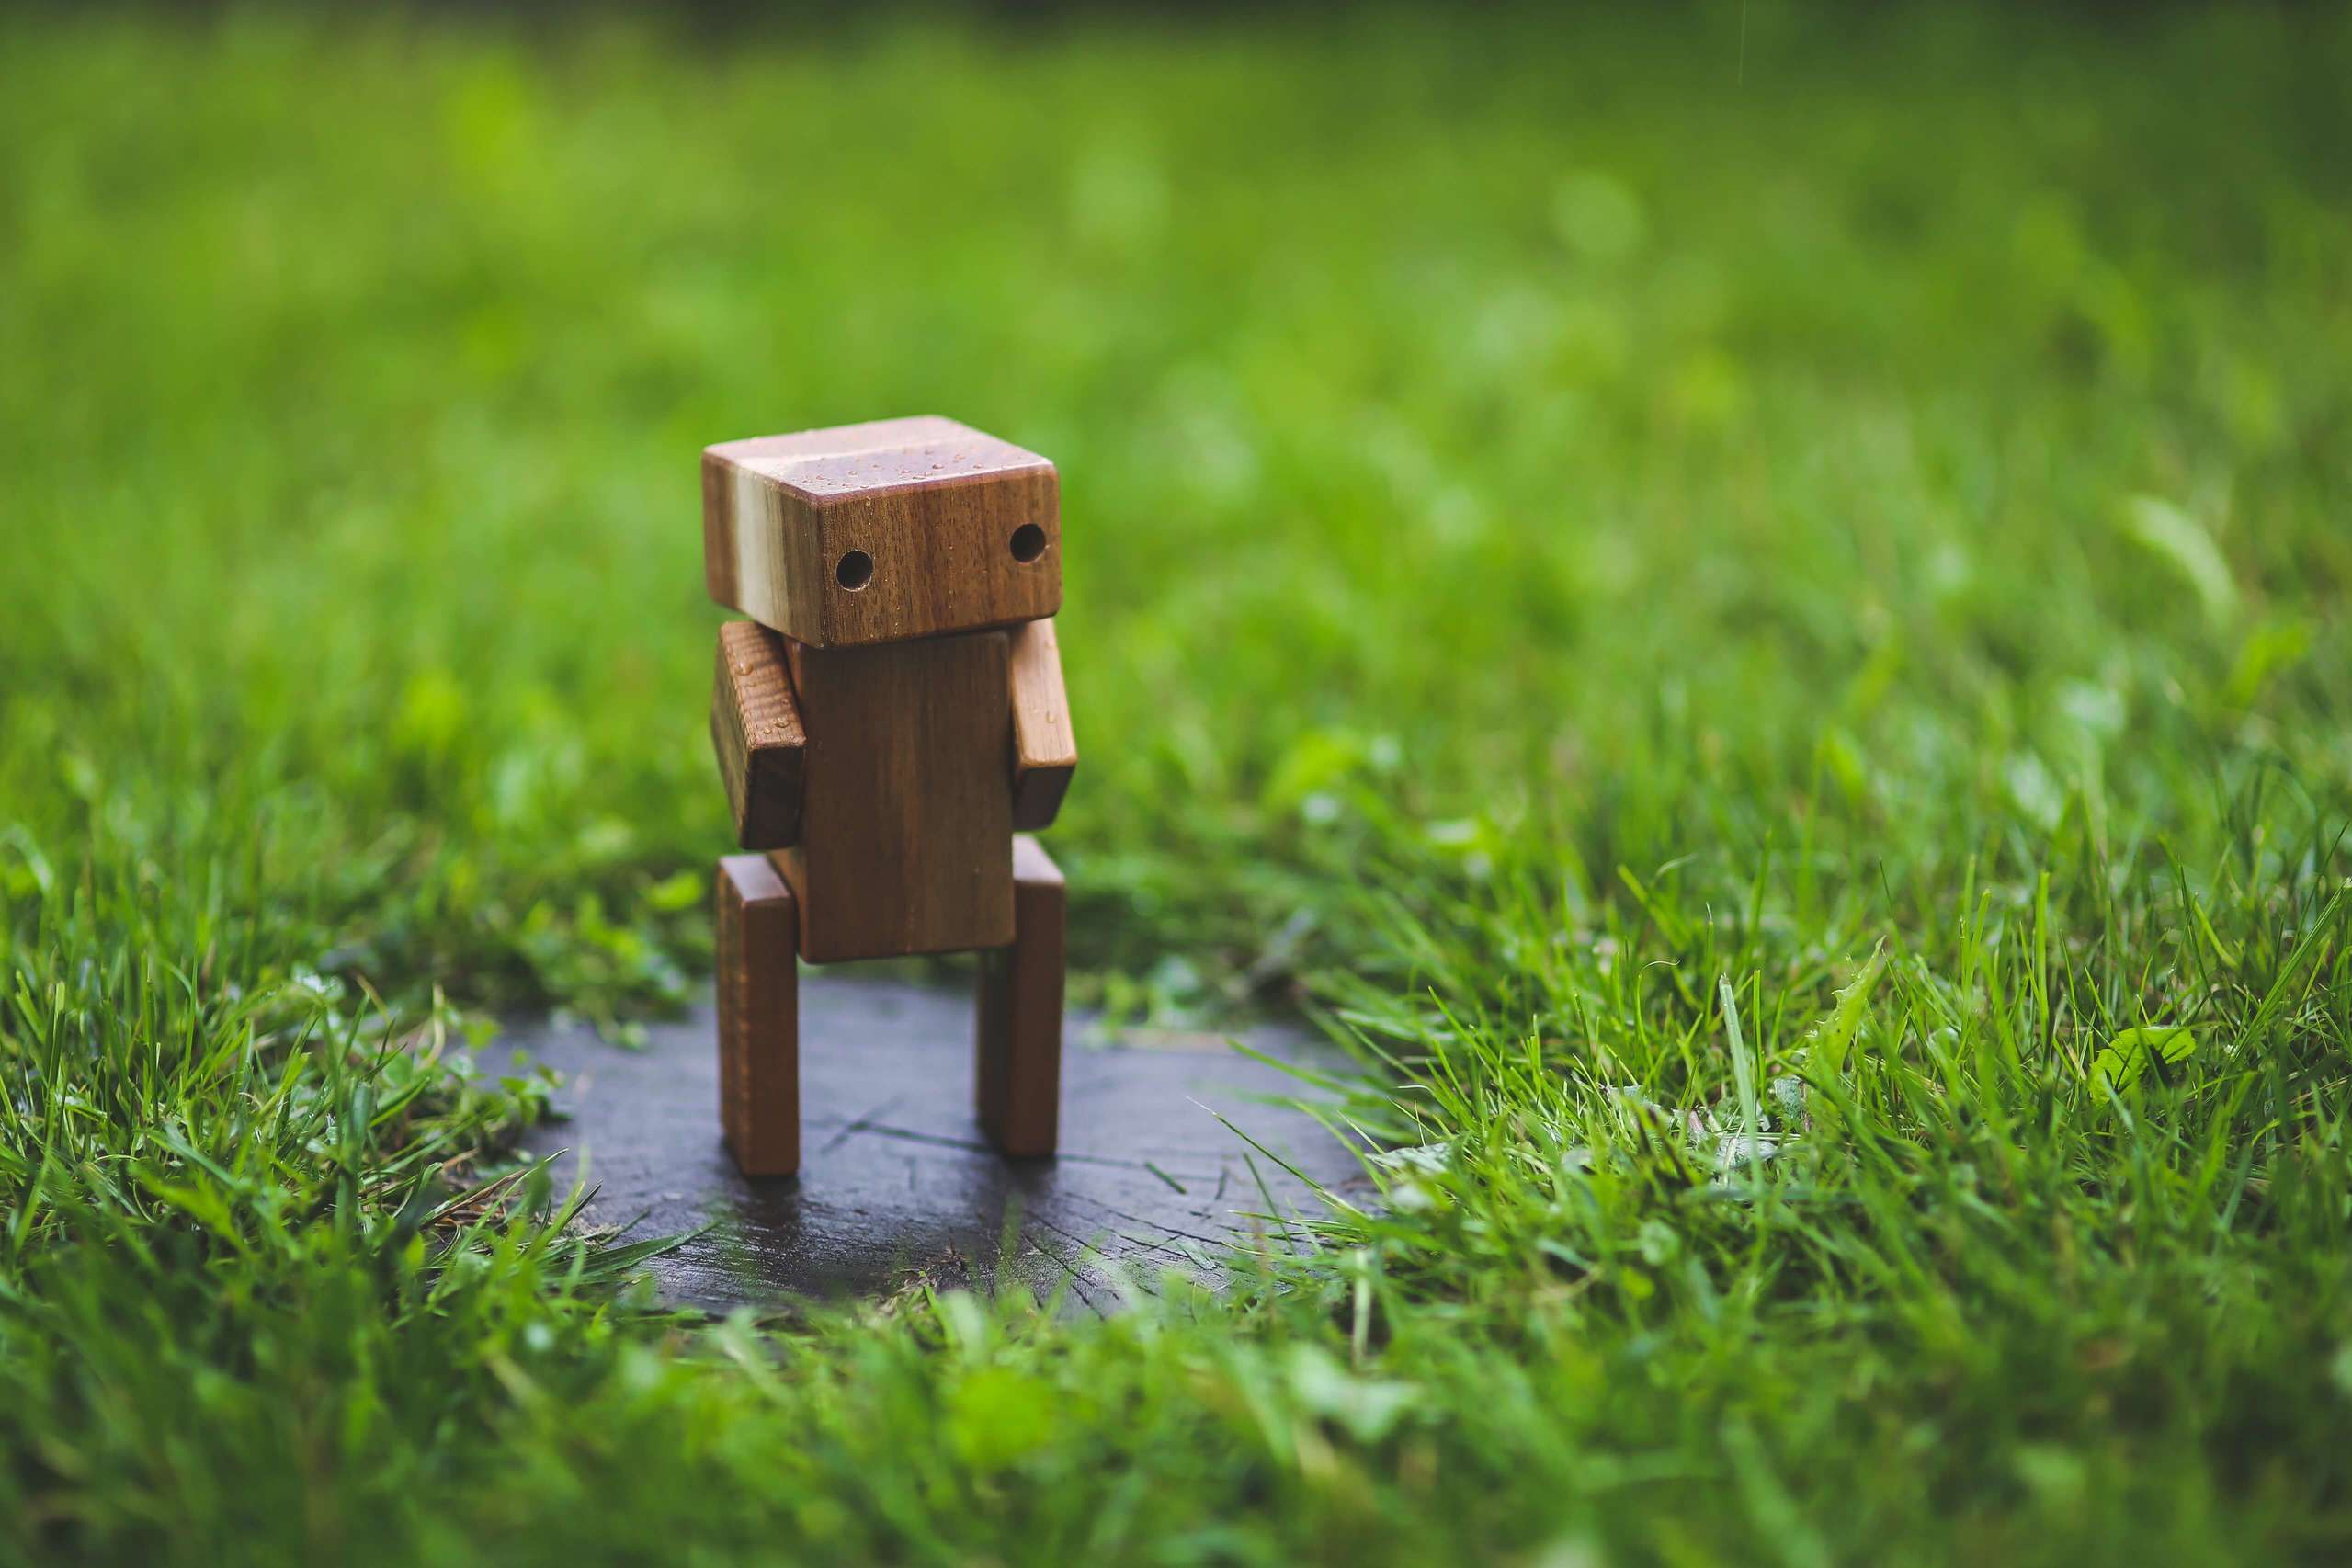 HubSpot's GrowthBot has arrived!